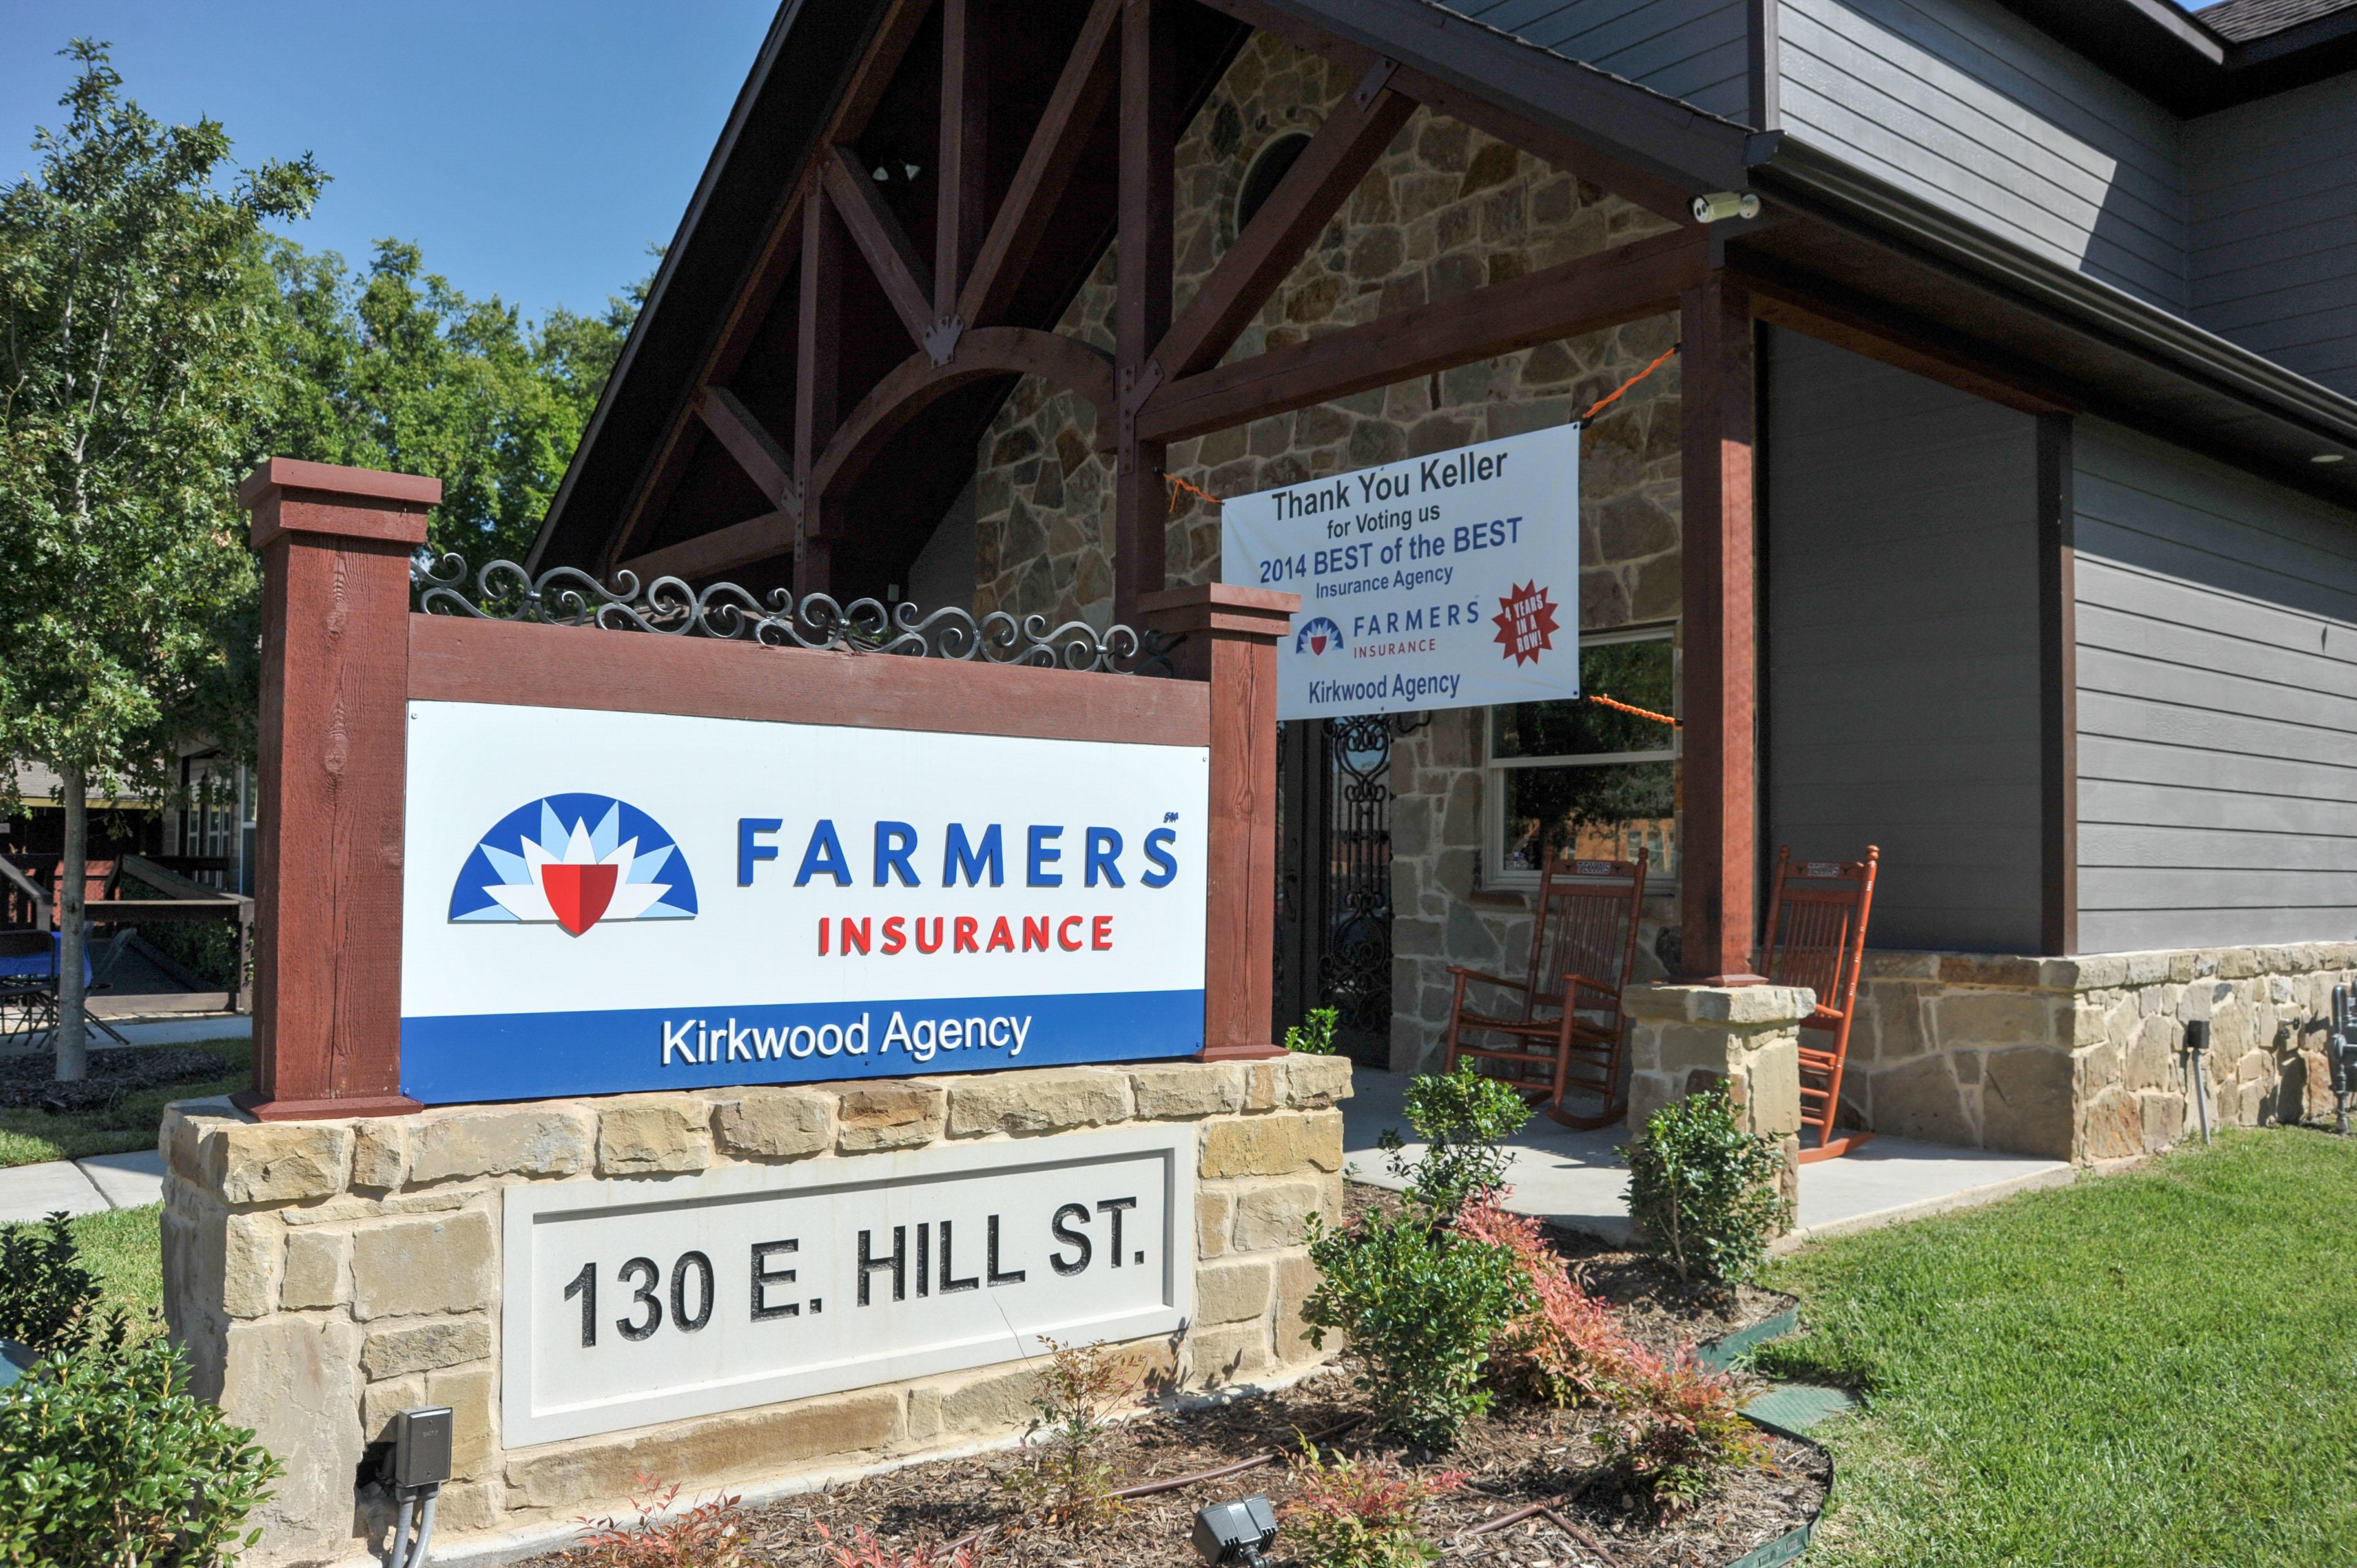 Farmers Insurance - Edward Kirkwood image 1